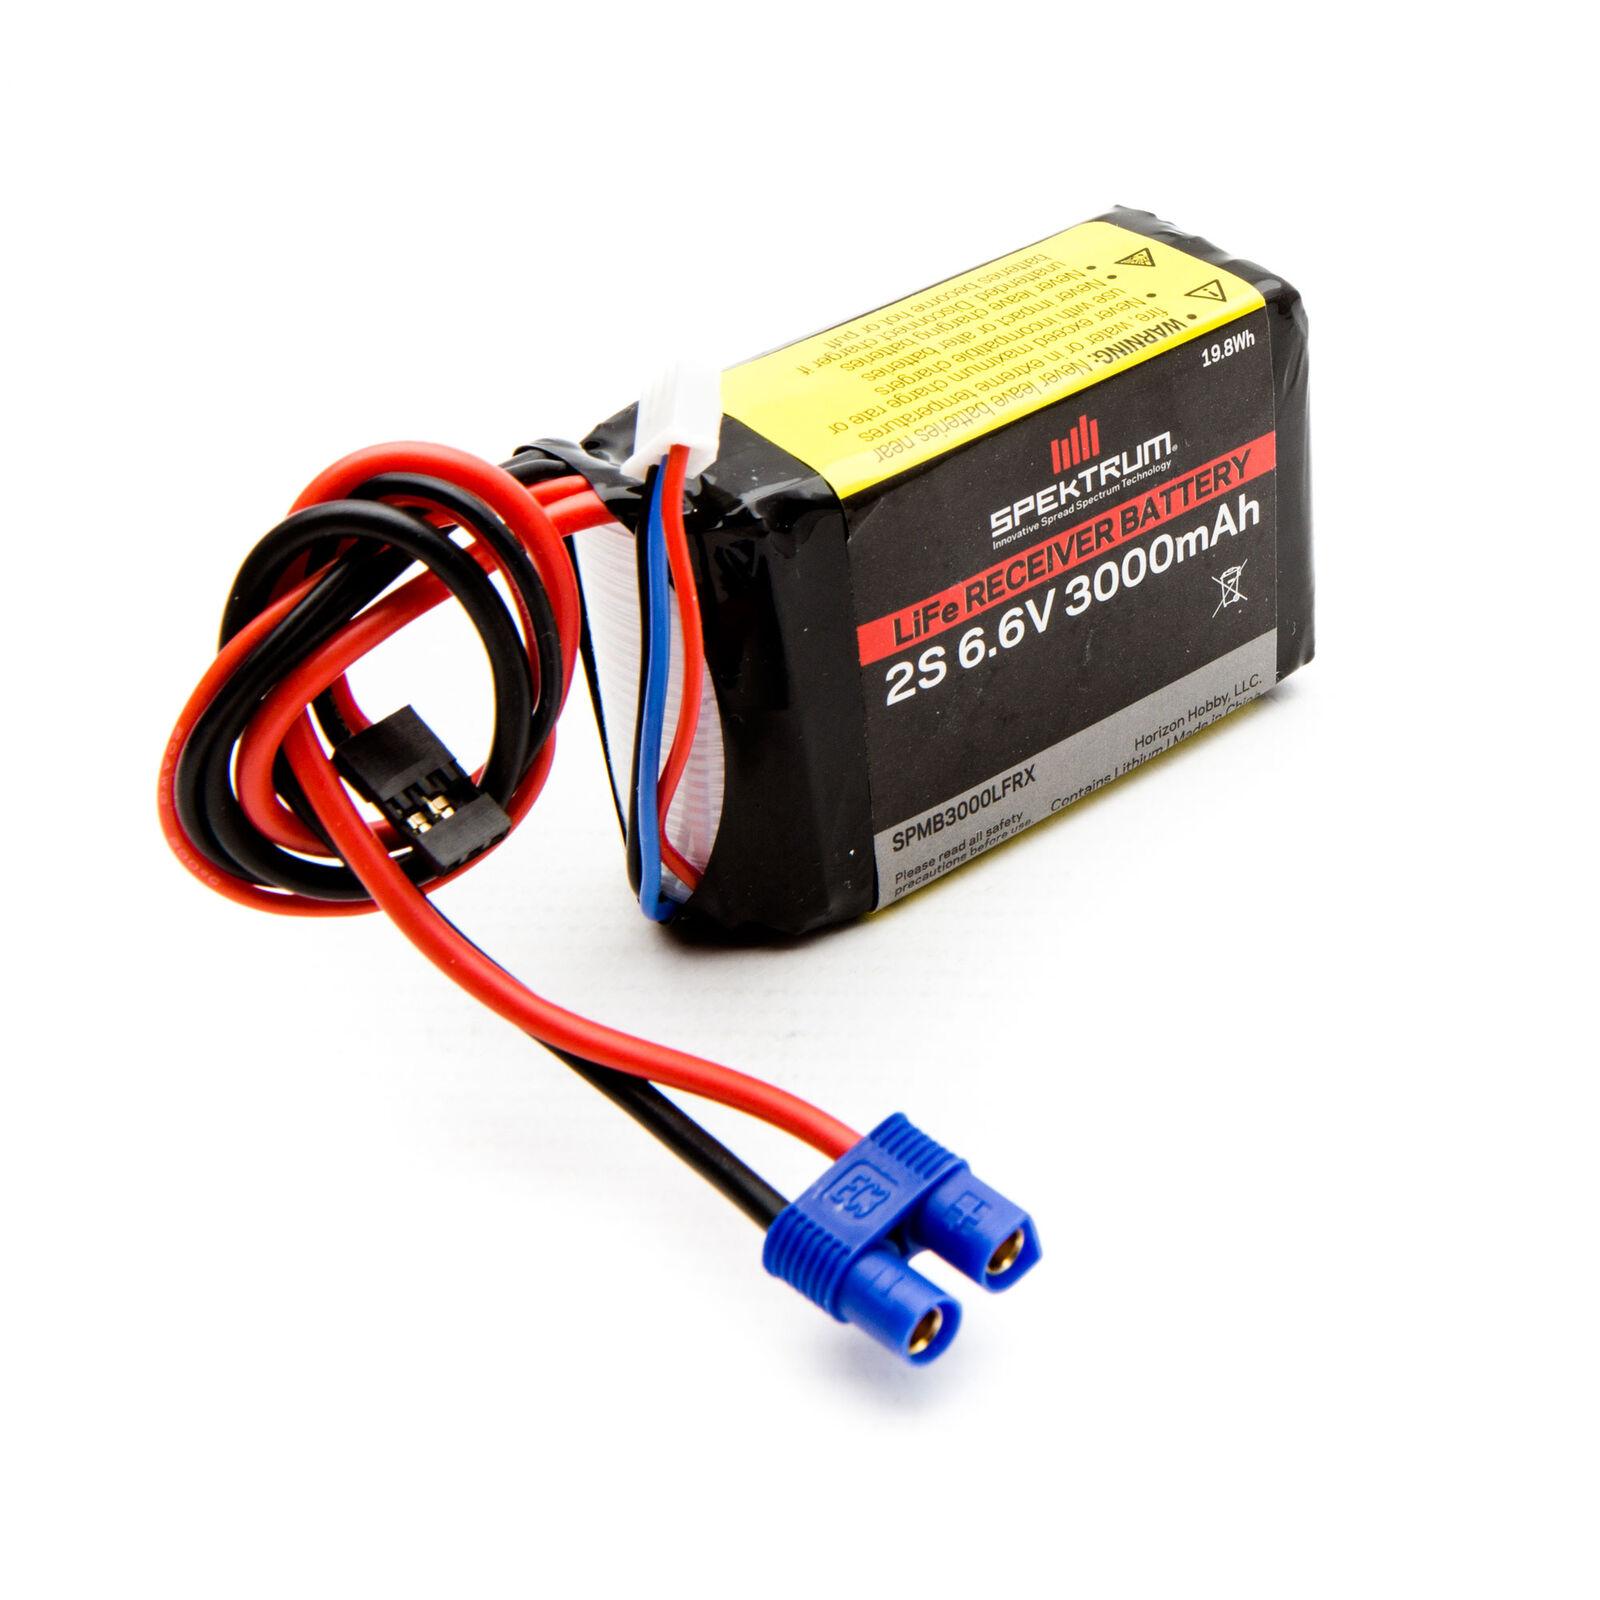 6.6V 3000mAh 2S LiFe Receiver Battery: Universal Receiver, EC3